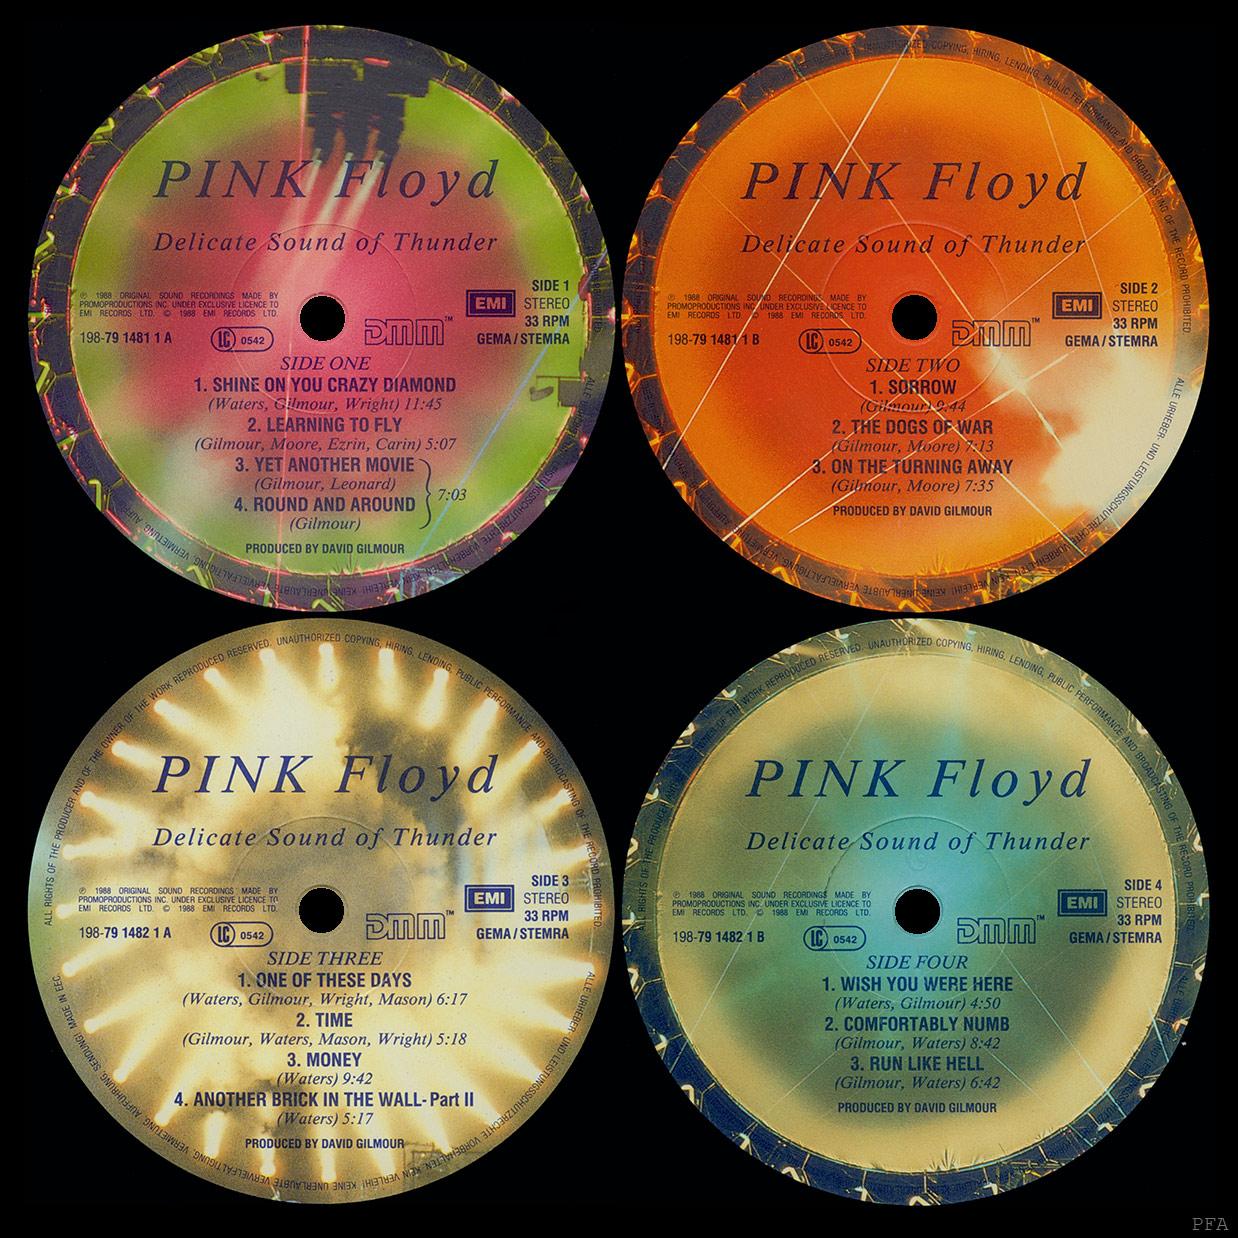 Pink floyd delicate sound of thunder музыка в mp3 -